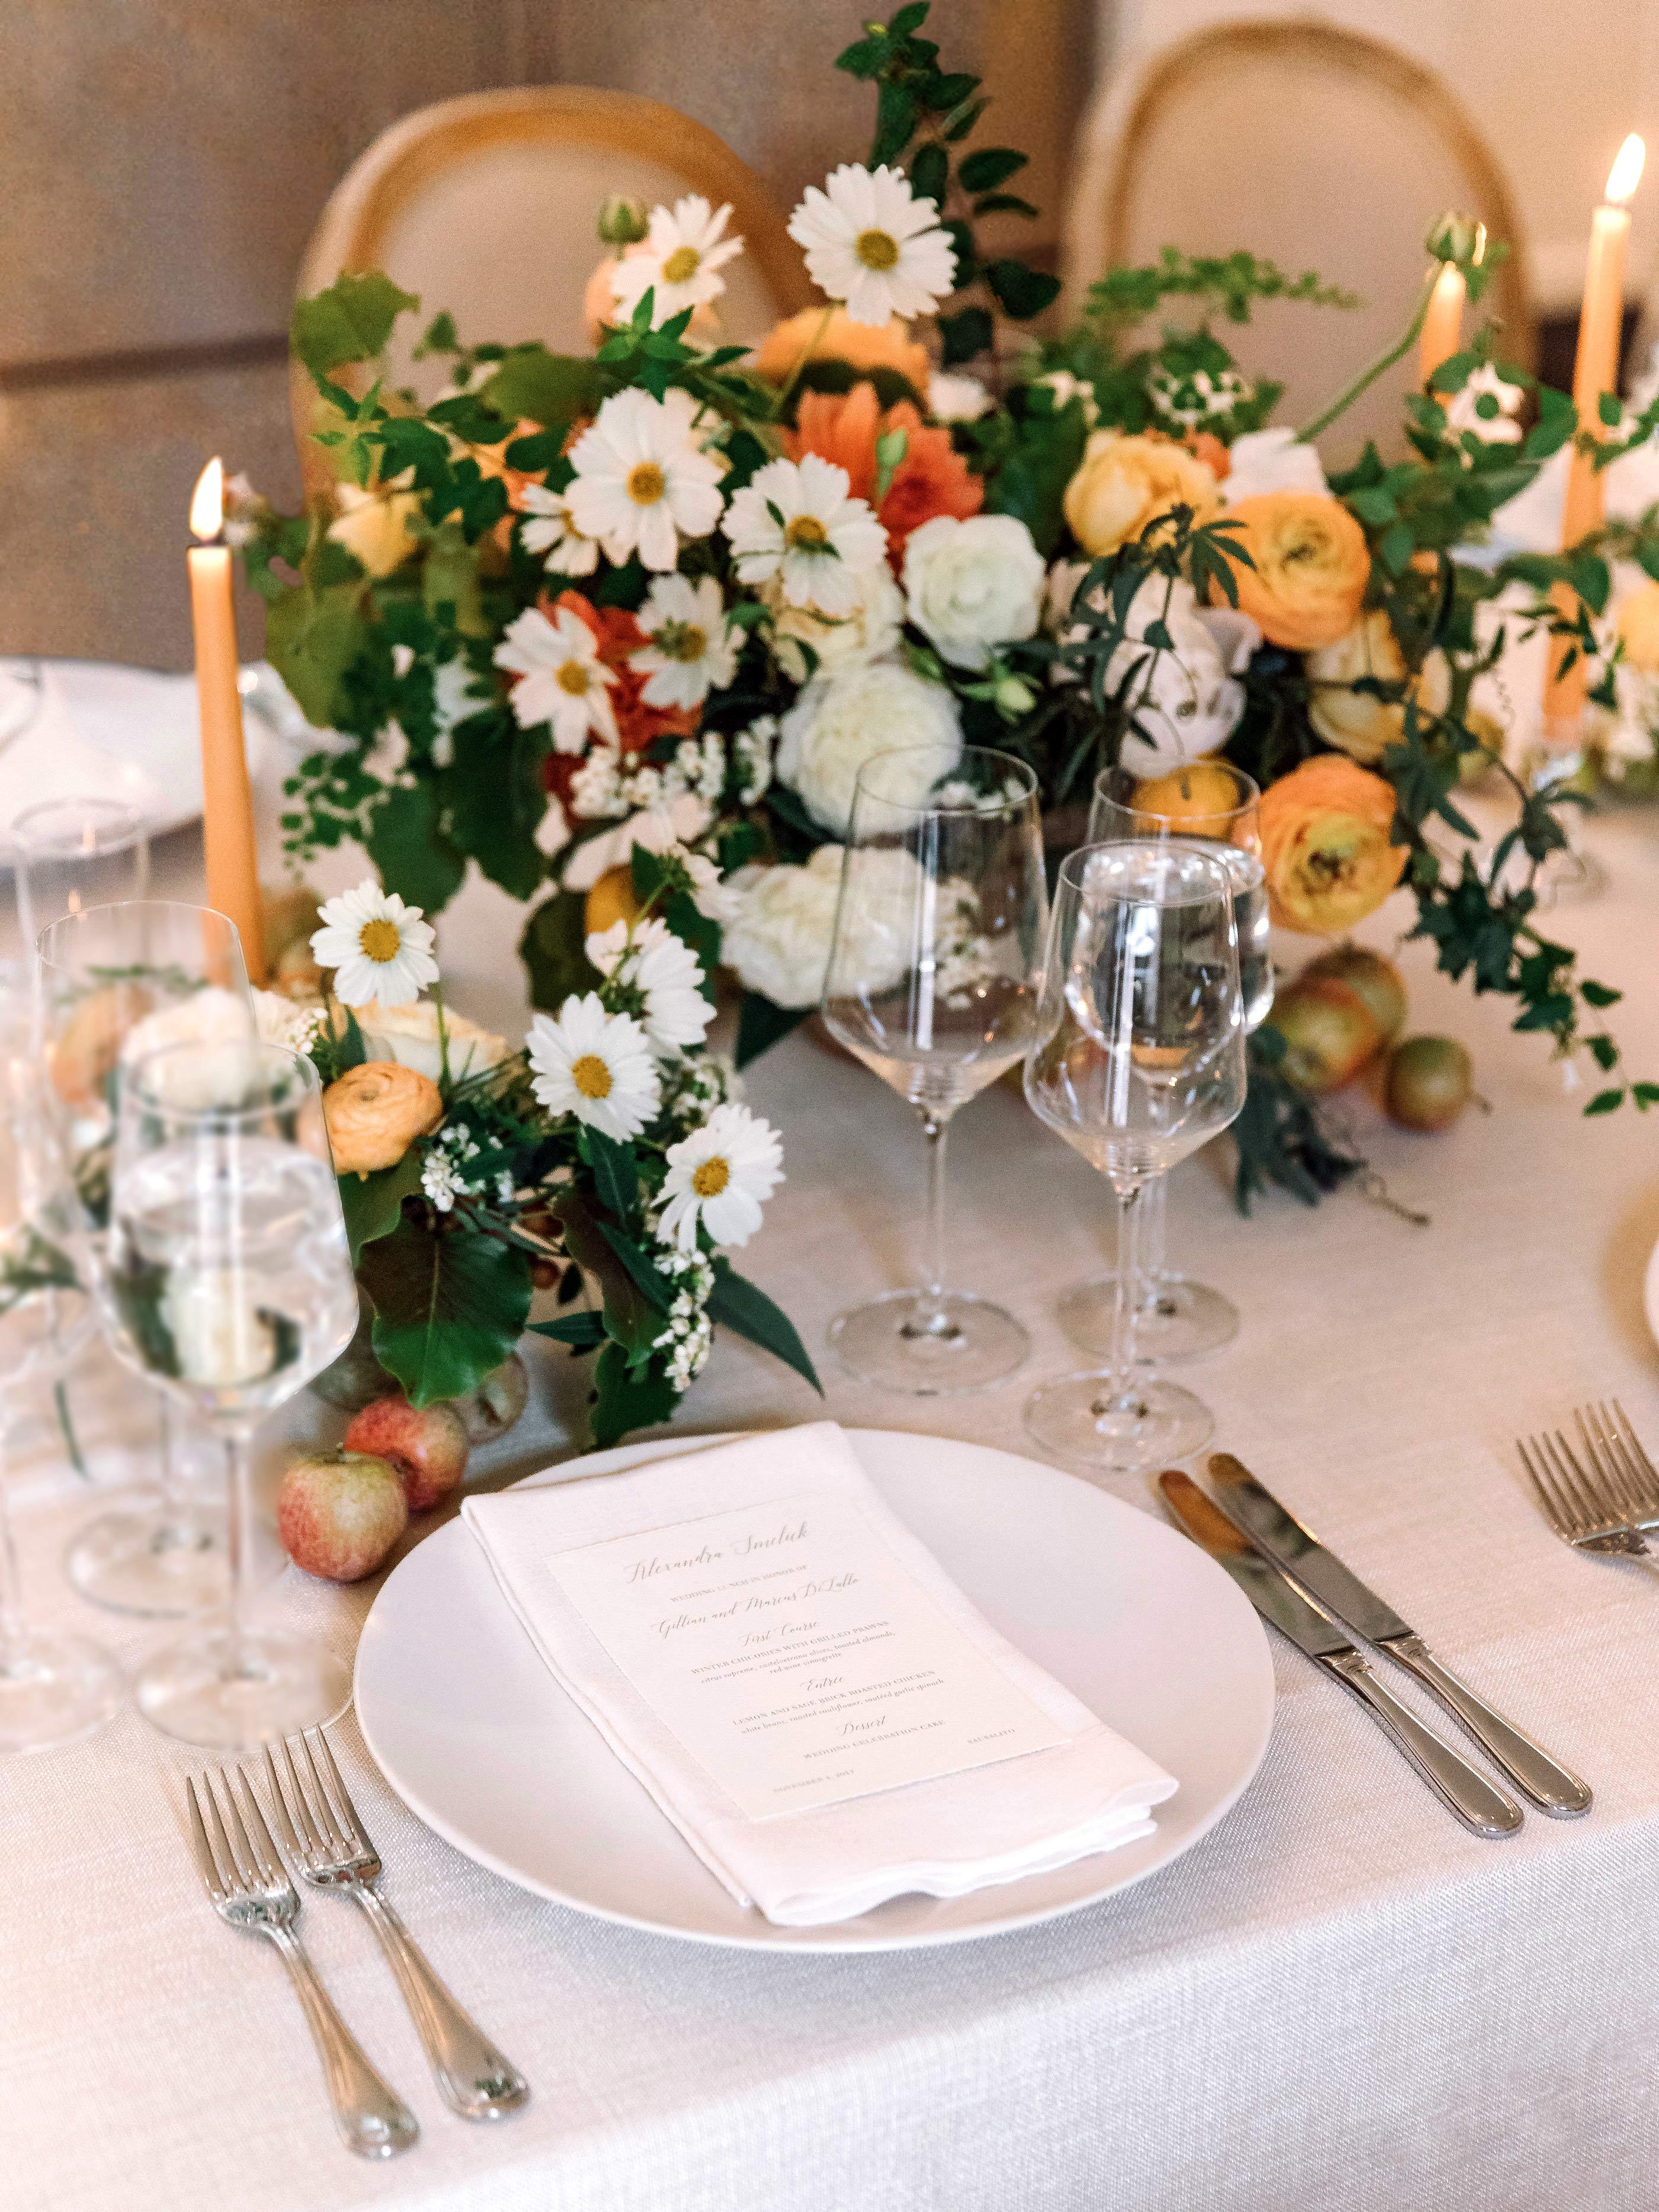 gillian marcus wedding place setting